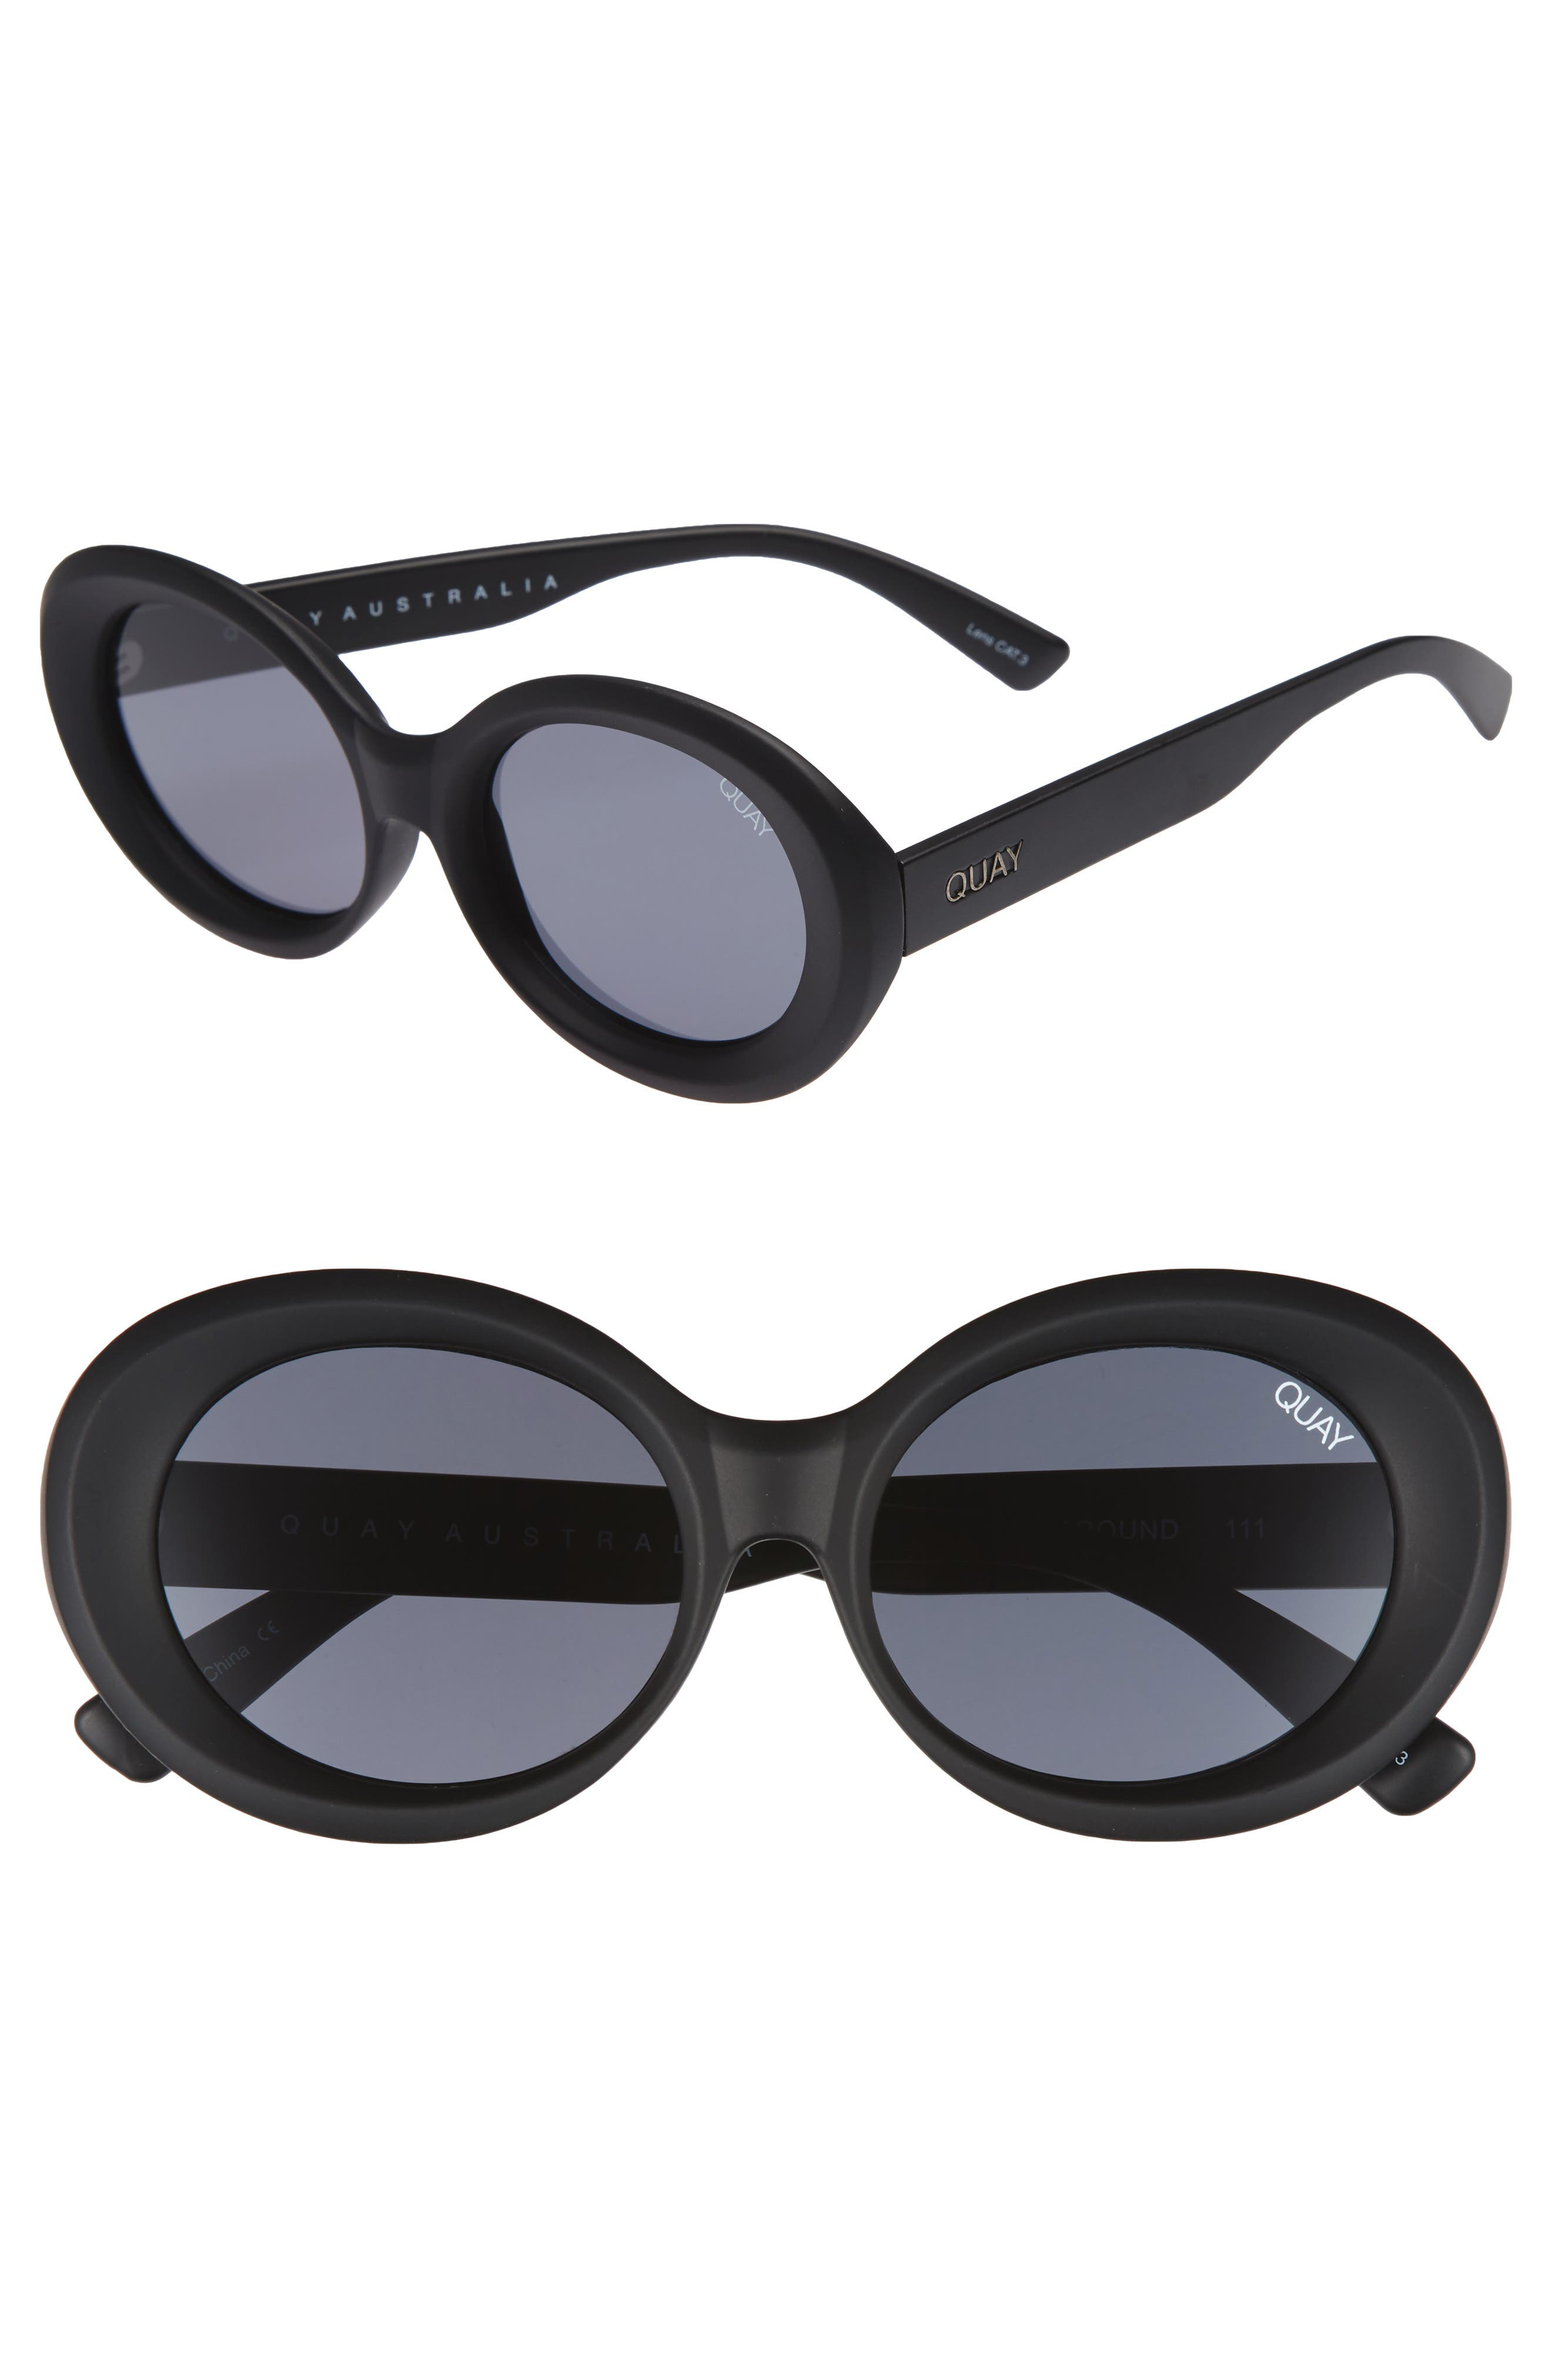 Main Image - Quay Australia Mess Around 52mm Oval Sunglasses